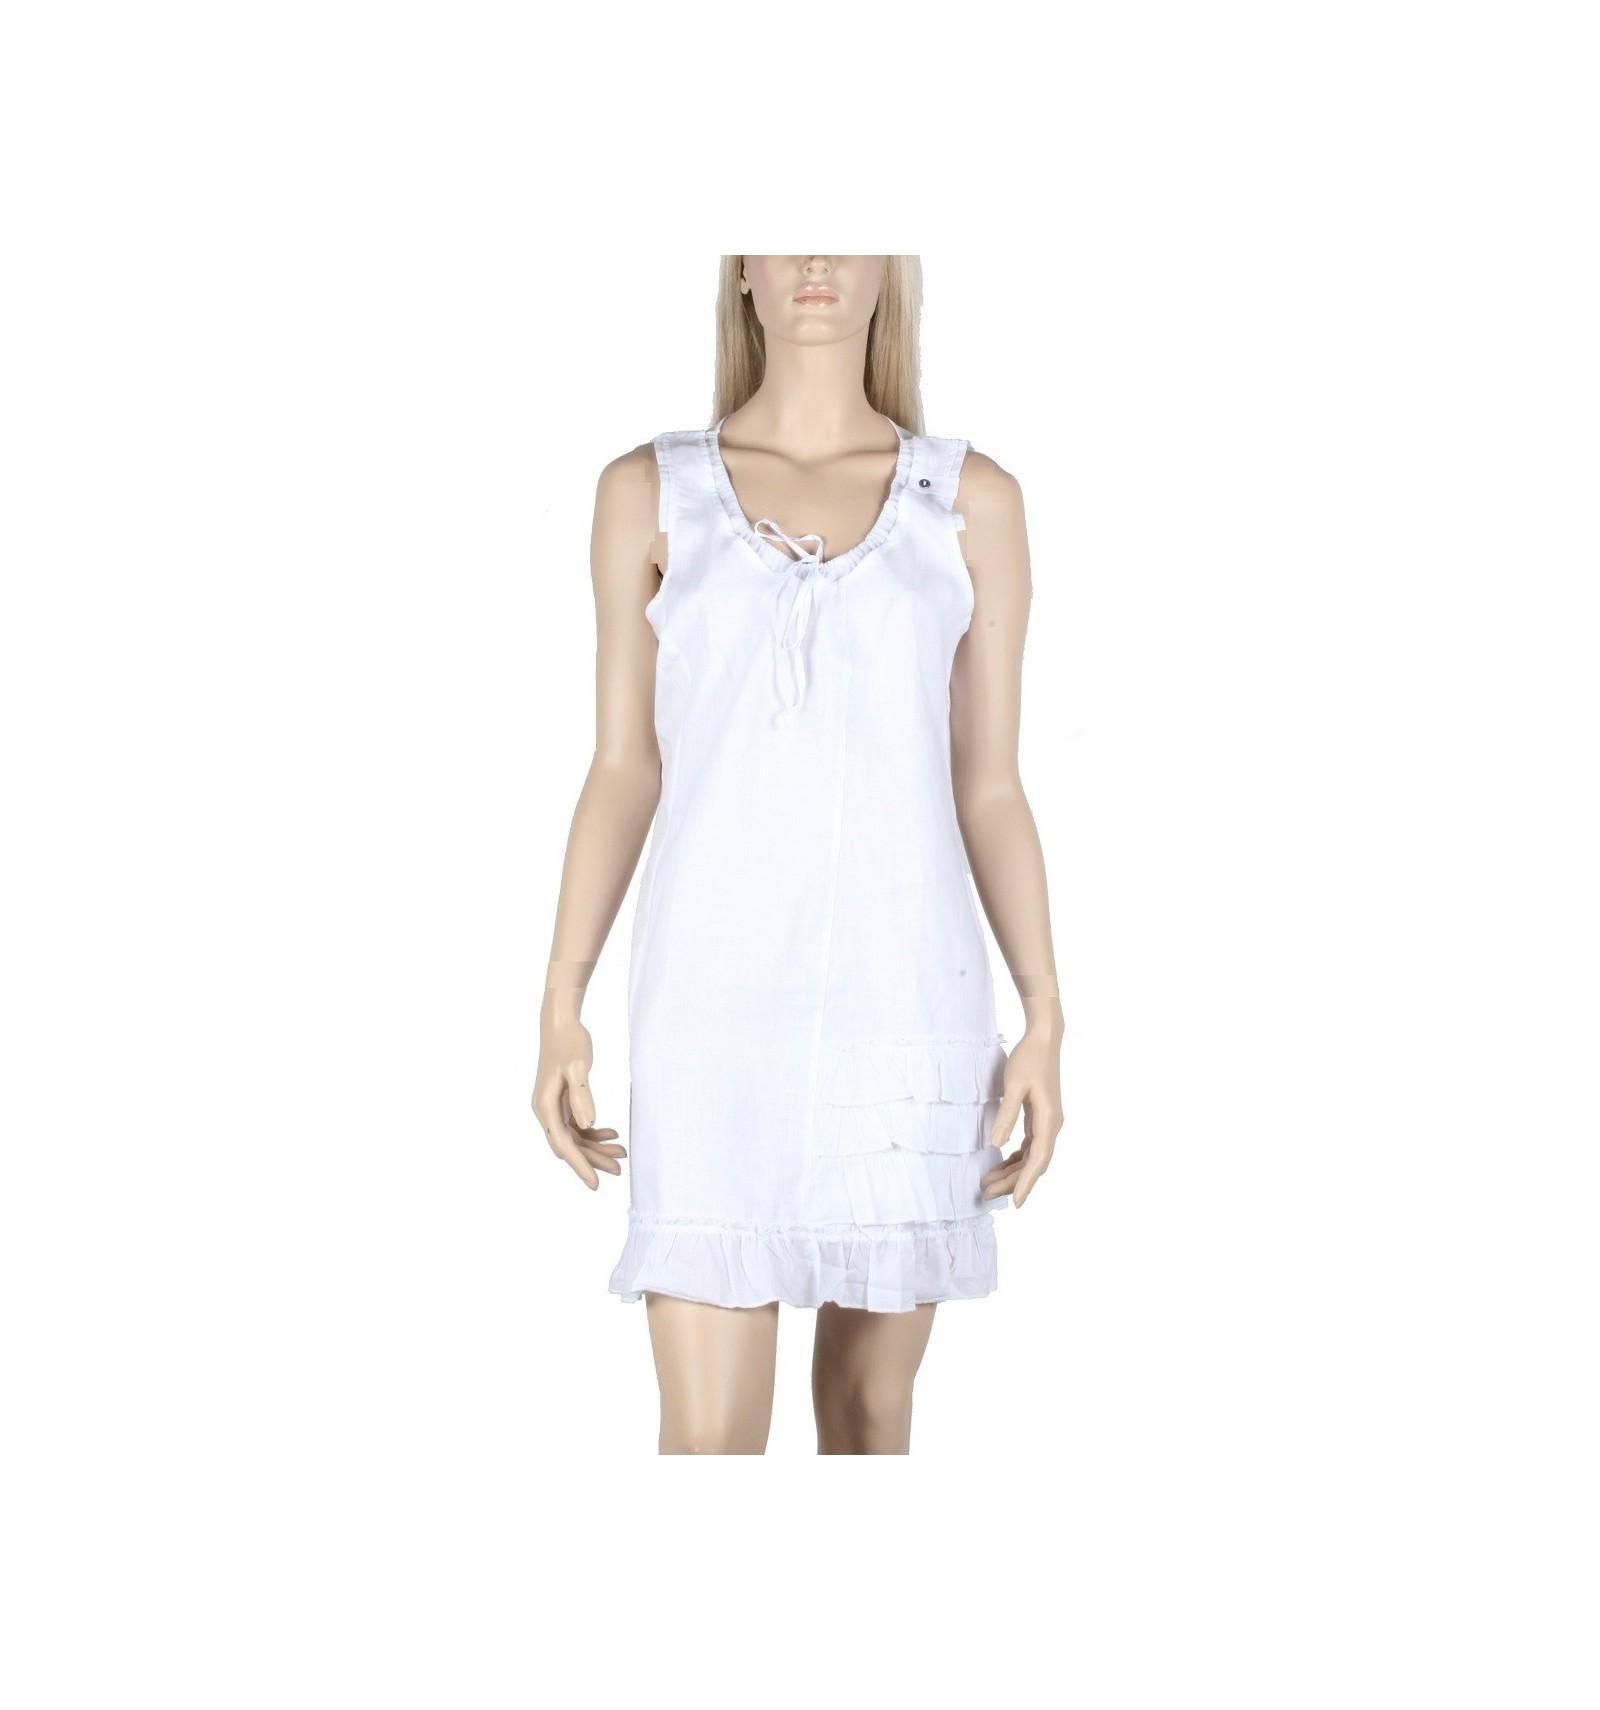 robe blanche maloka en lin et coton mode mode femme. Black Bedroom Furniture Sets. Home Design Ideas